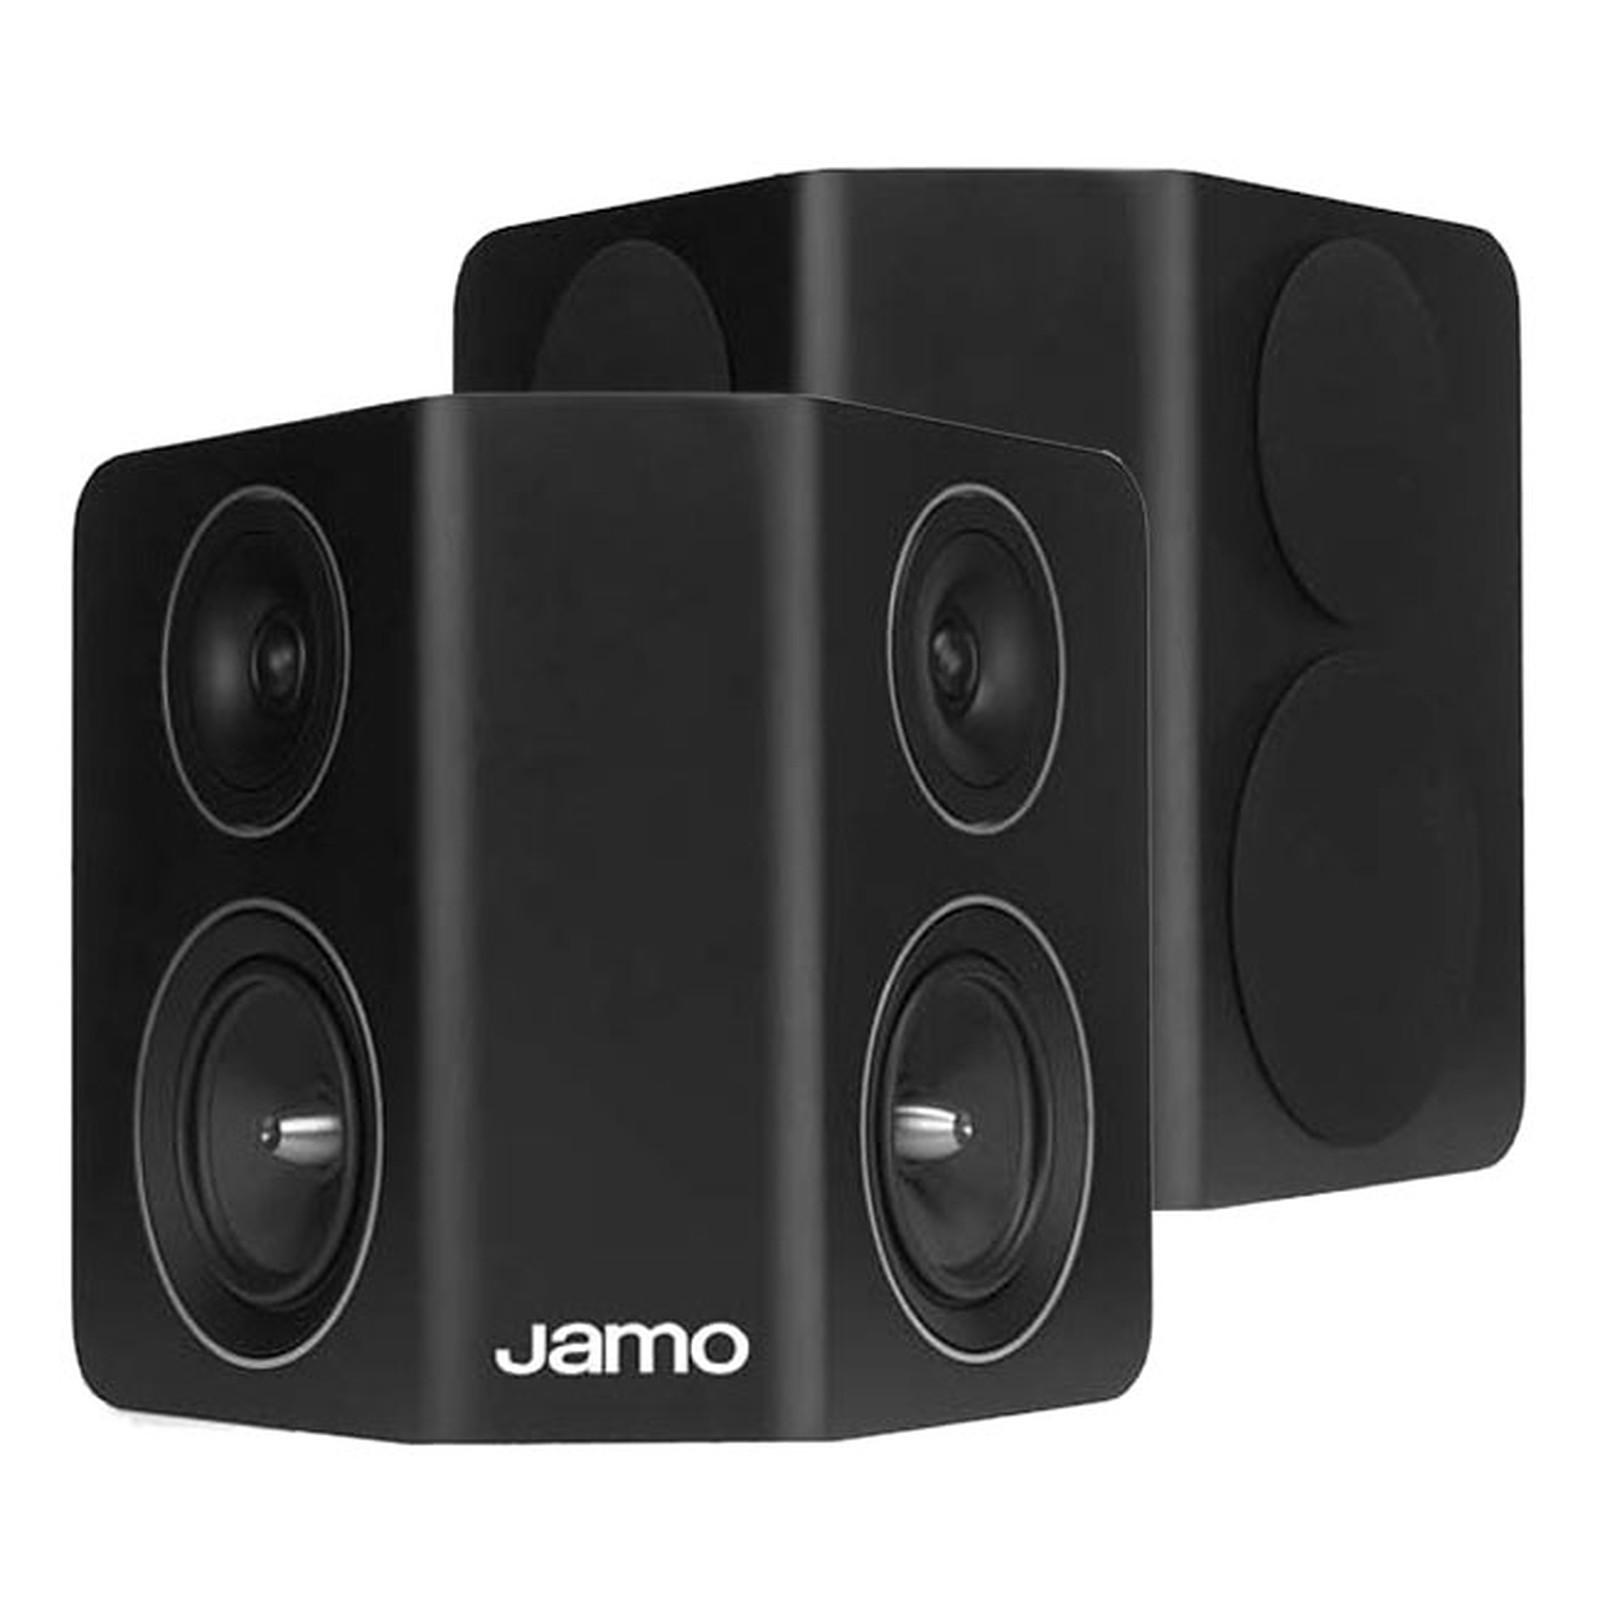 Jamo C10 SUR High Gloss Black